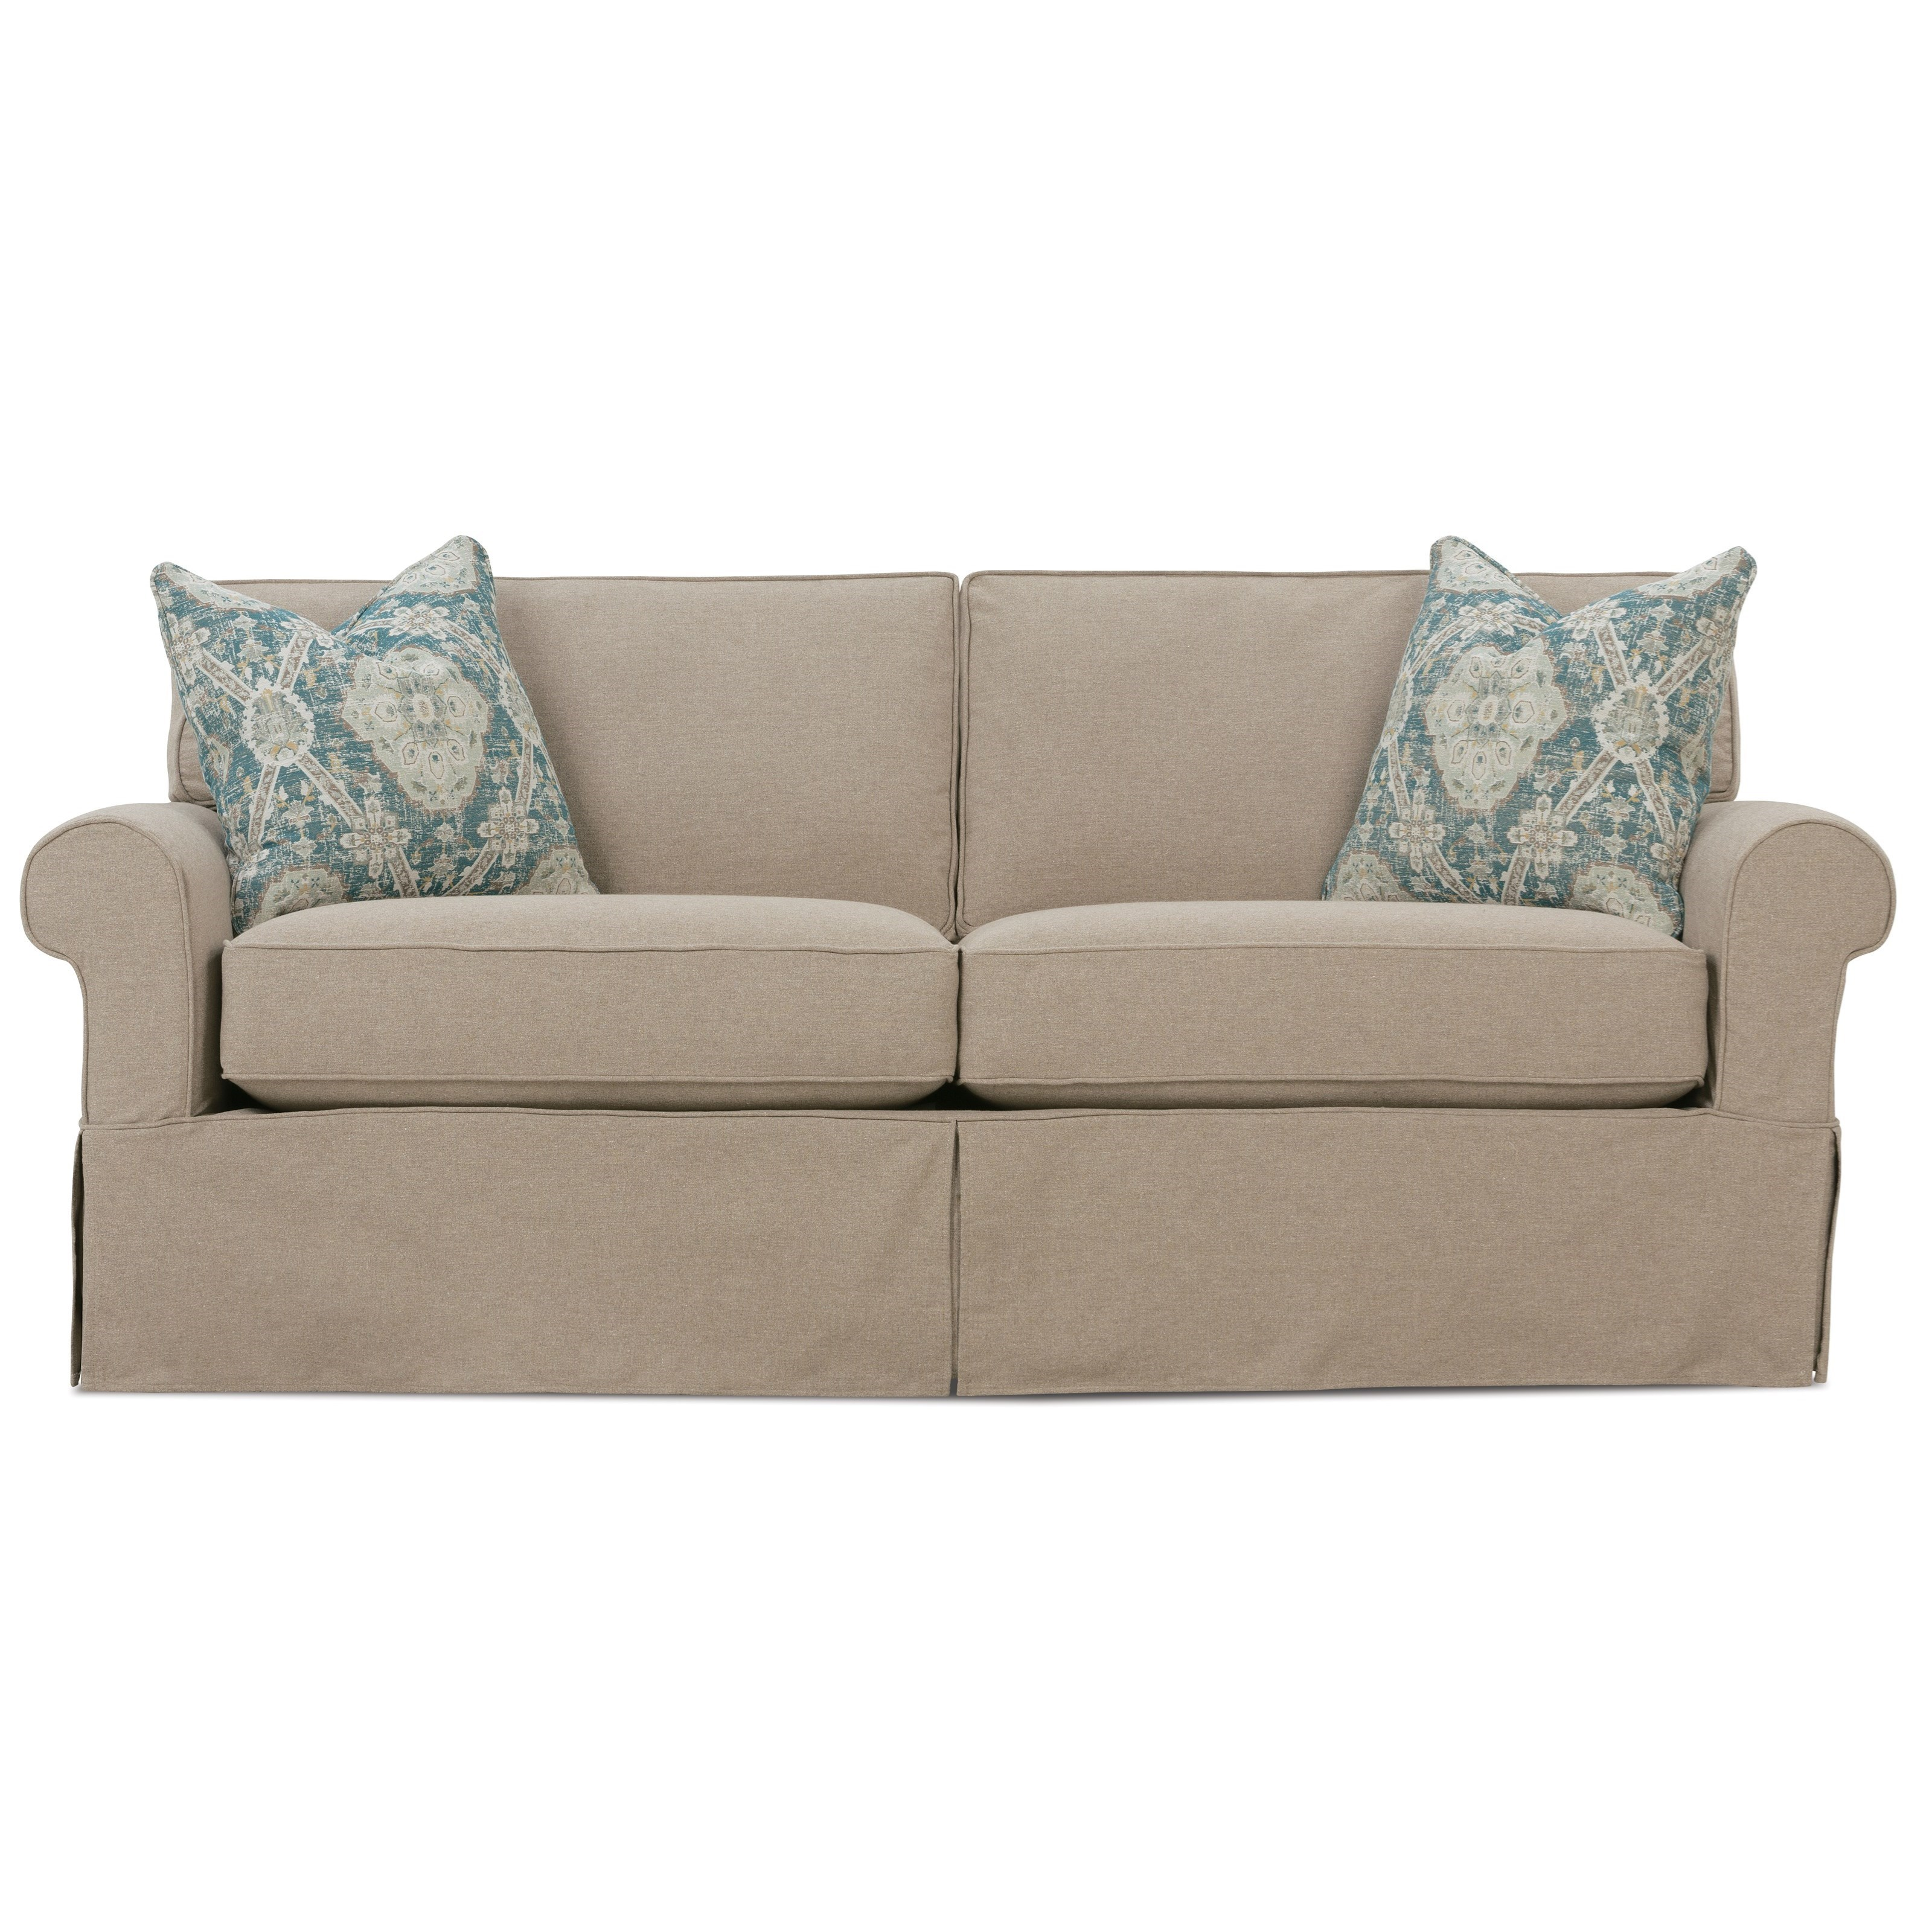 Two Cushion Sleeper Sofa